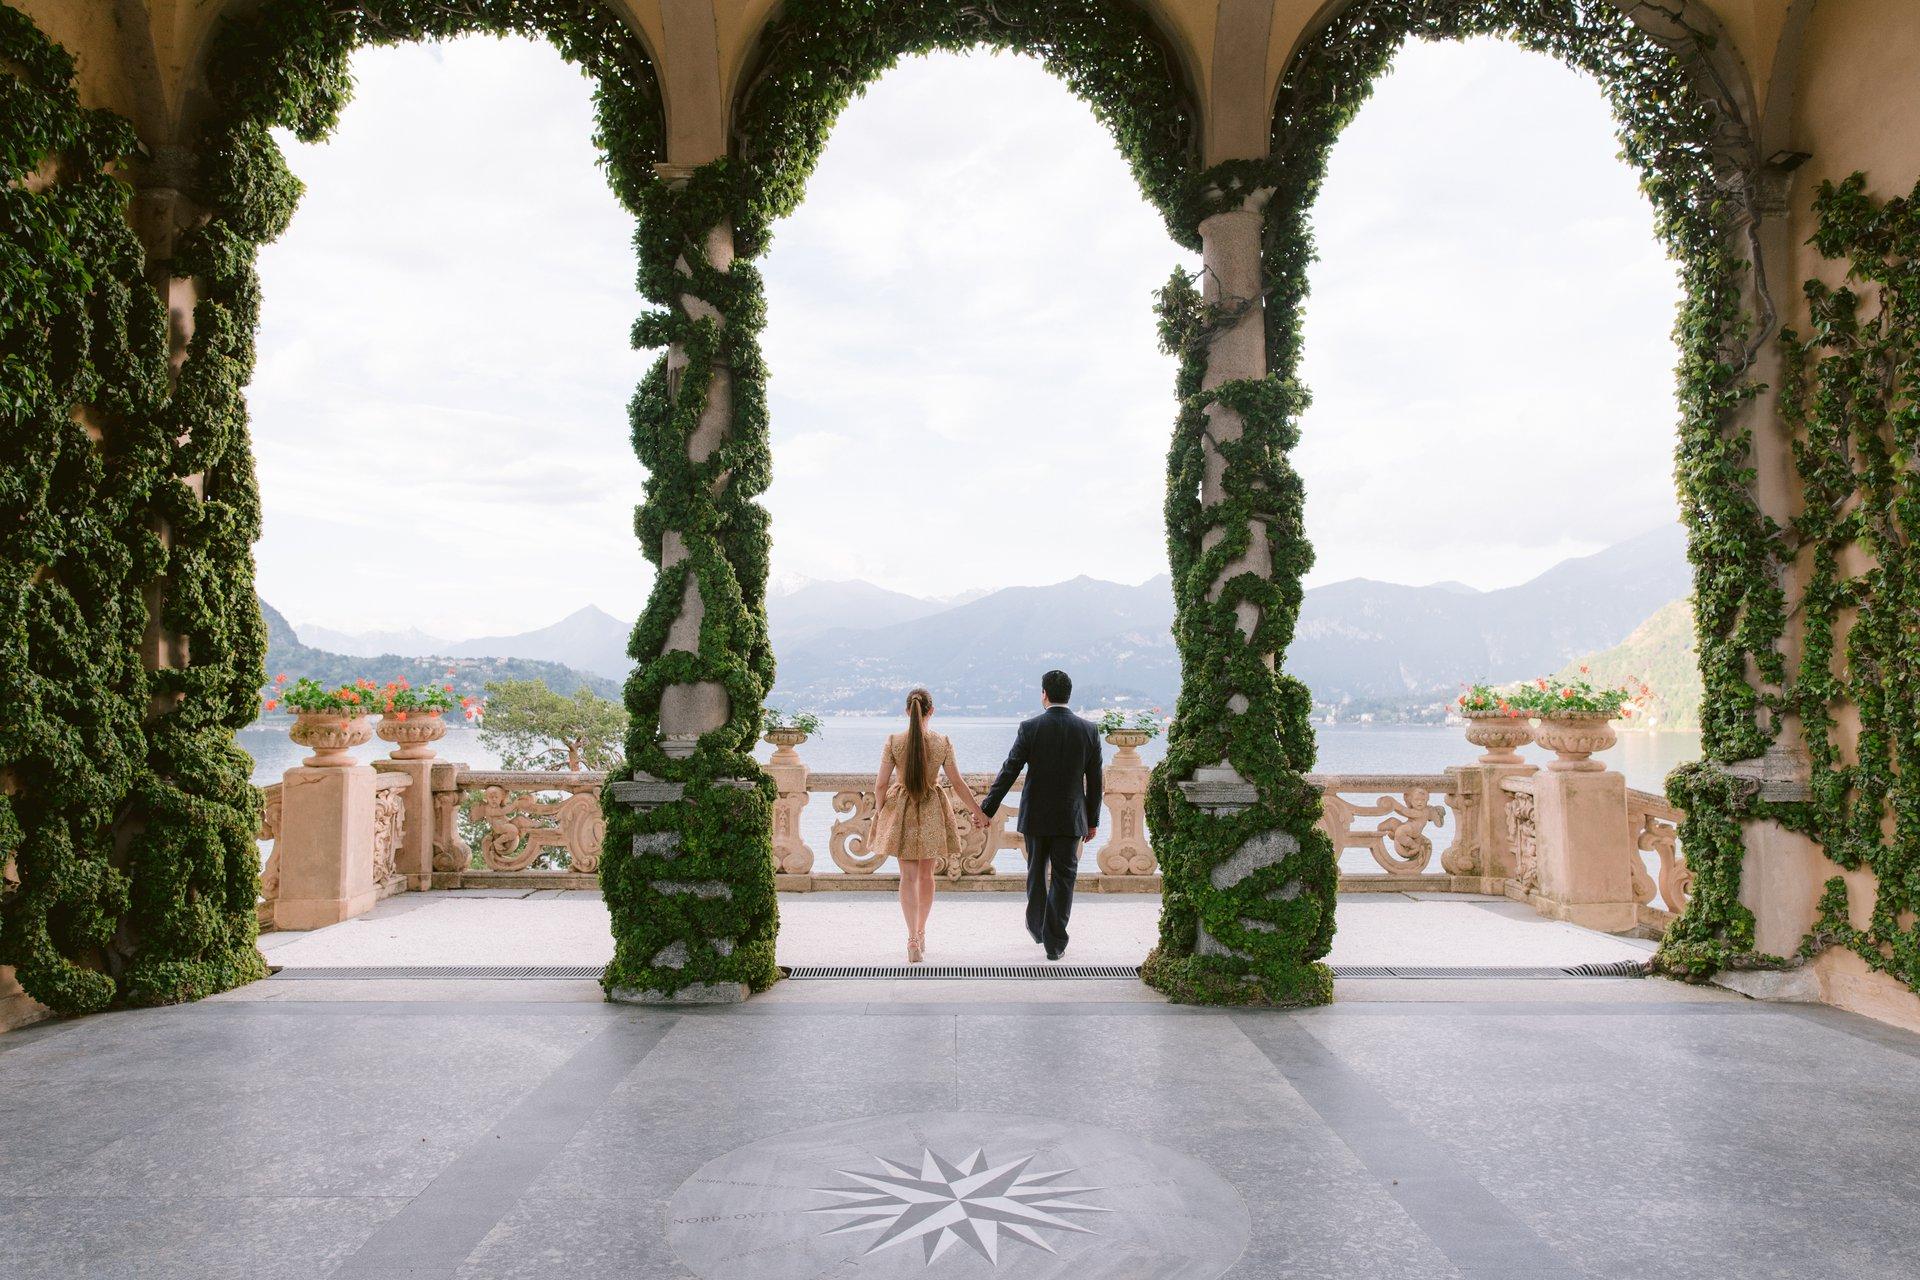 Lake Como-Italy-travel-story-Flytographer-108